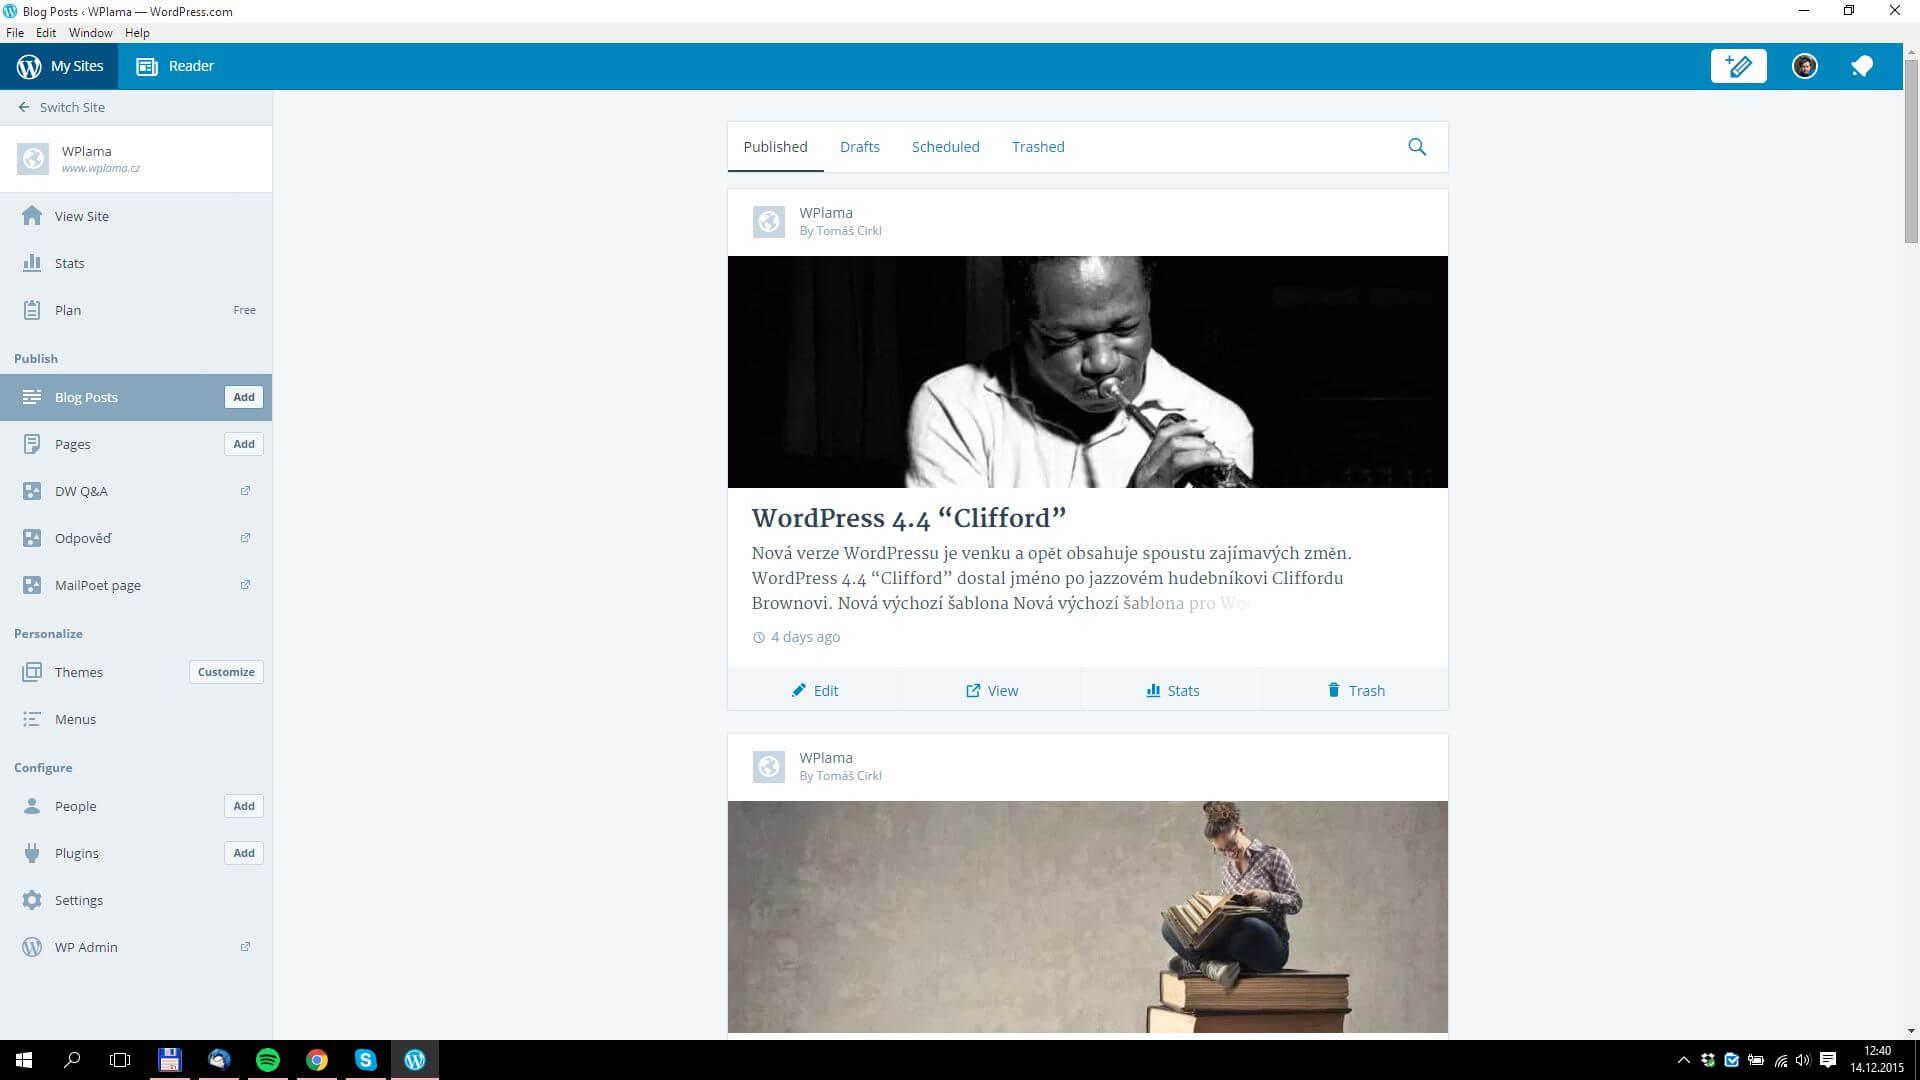 Správa webů aplikace WordPress.org